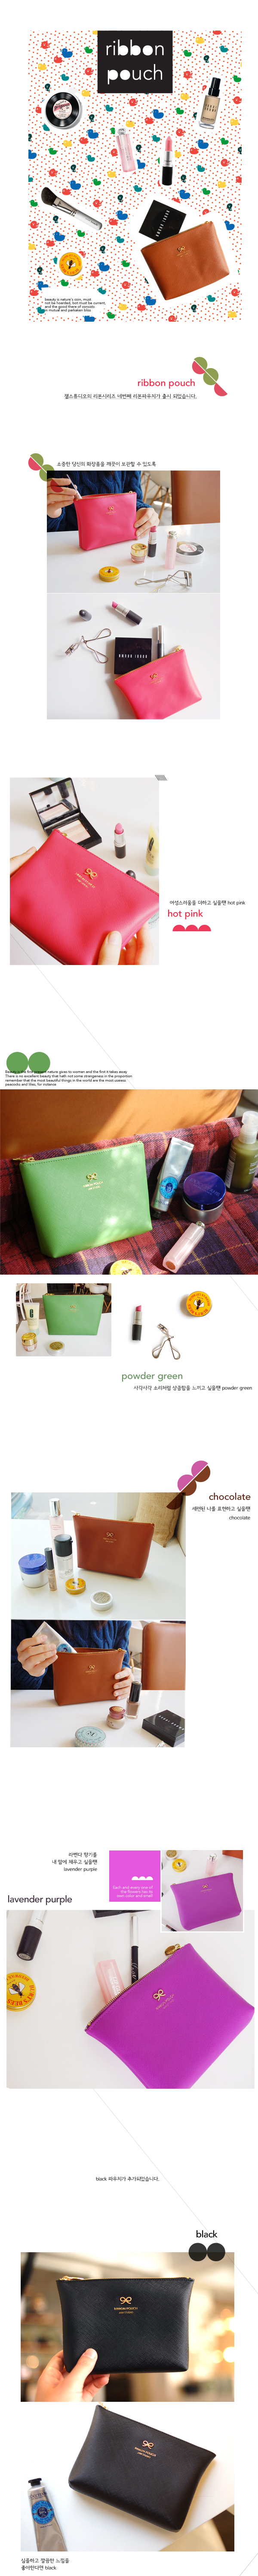 ribbon pouch - 잼스튜디오, 10,500원, 화장품파우치, 애나멜/인조가죽